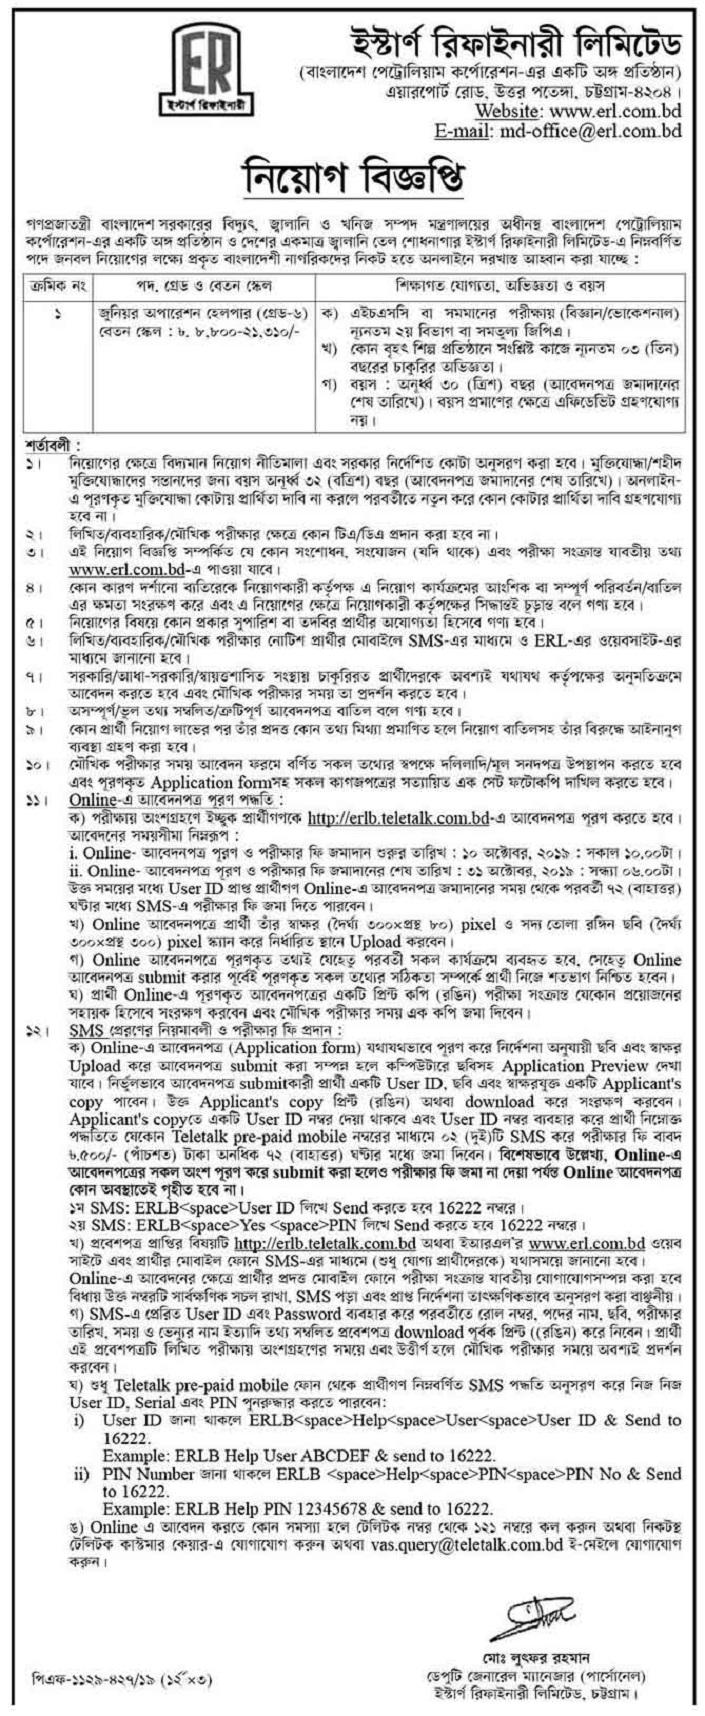 Eastern Refinery Limited Job Circular 2019